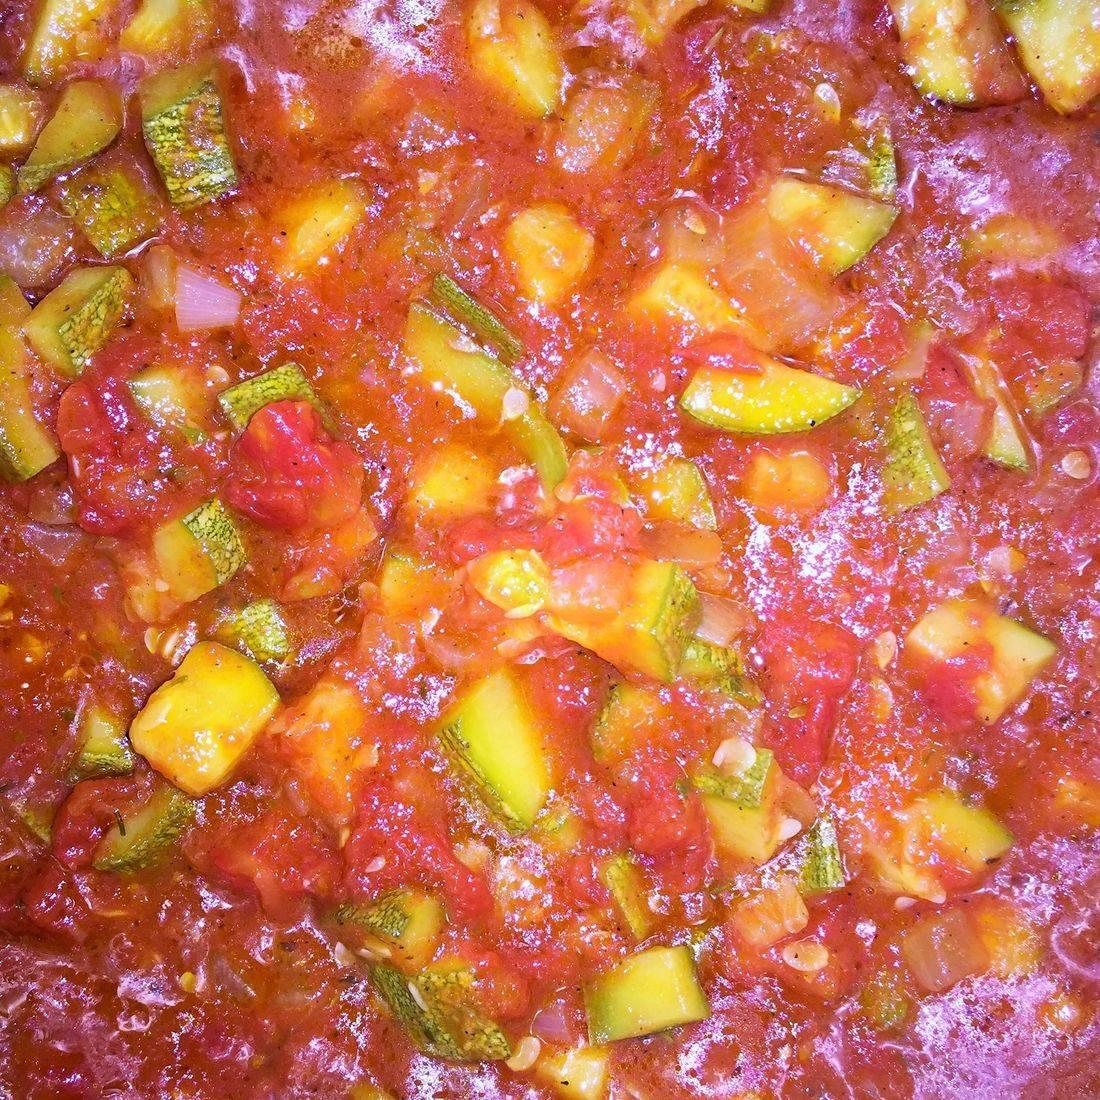 zucchini and tomato dish